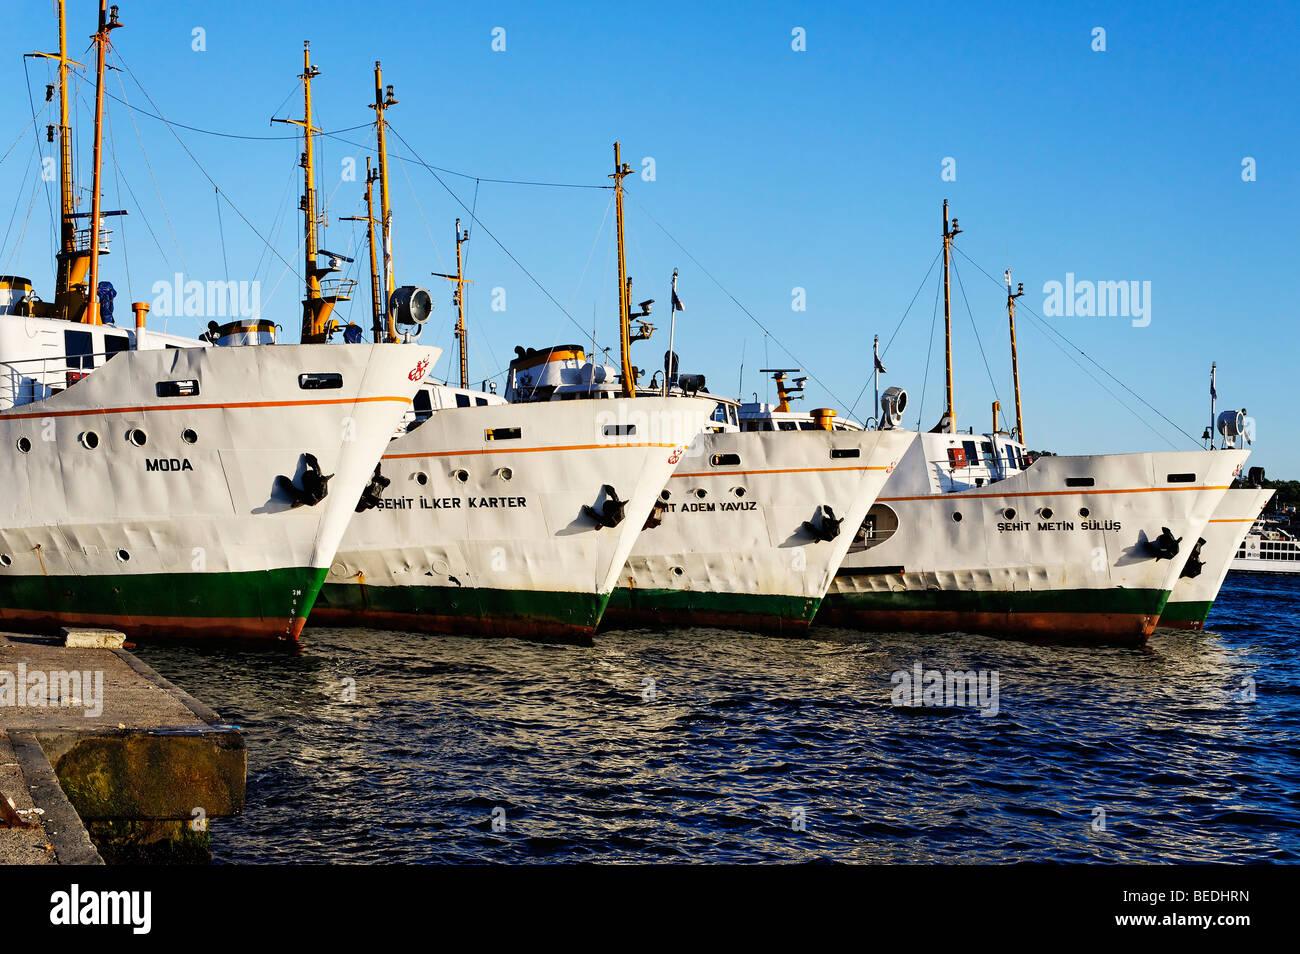 Bosphorus ferries moored on the dockside near Galata Bridge in the Beyoglu District of Istanbul. - Stock Image